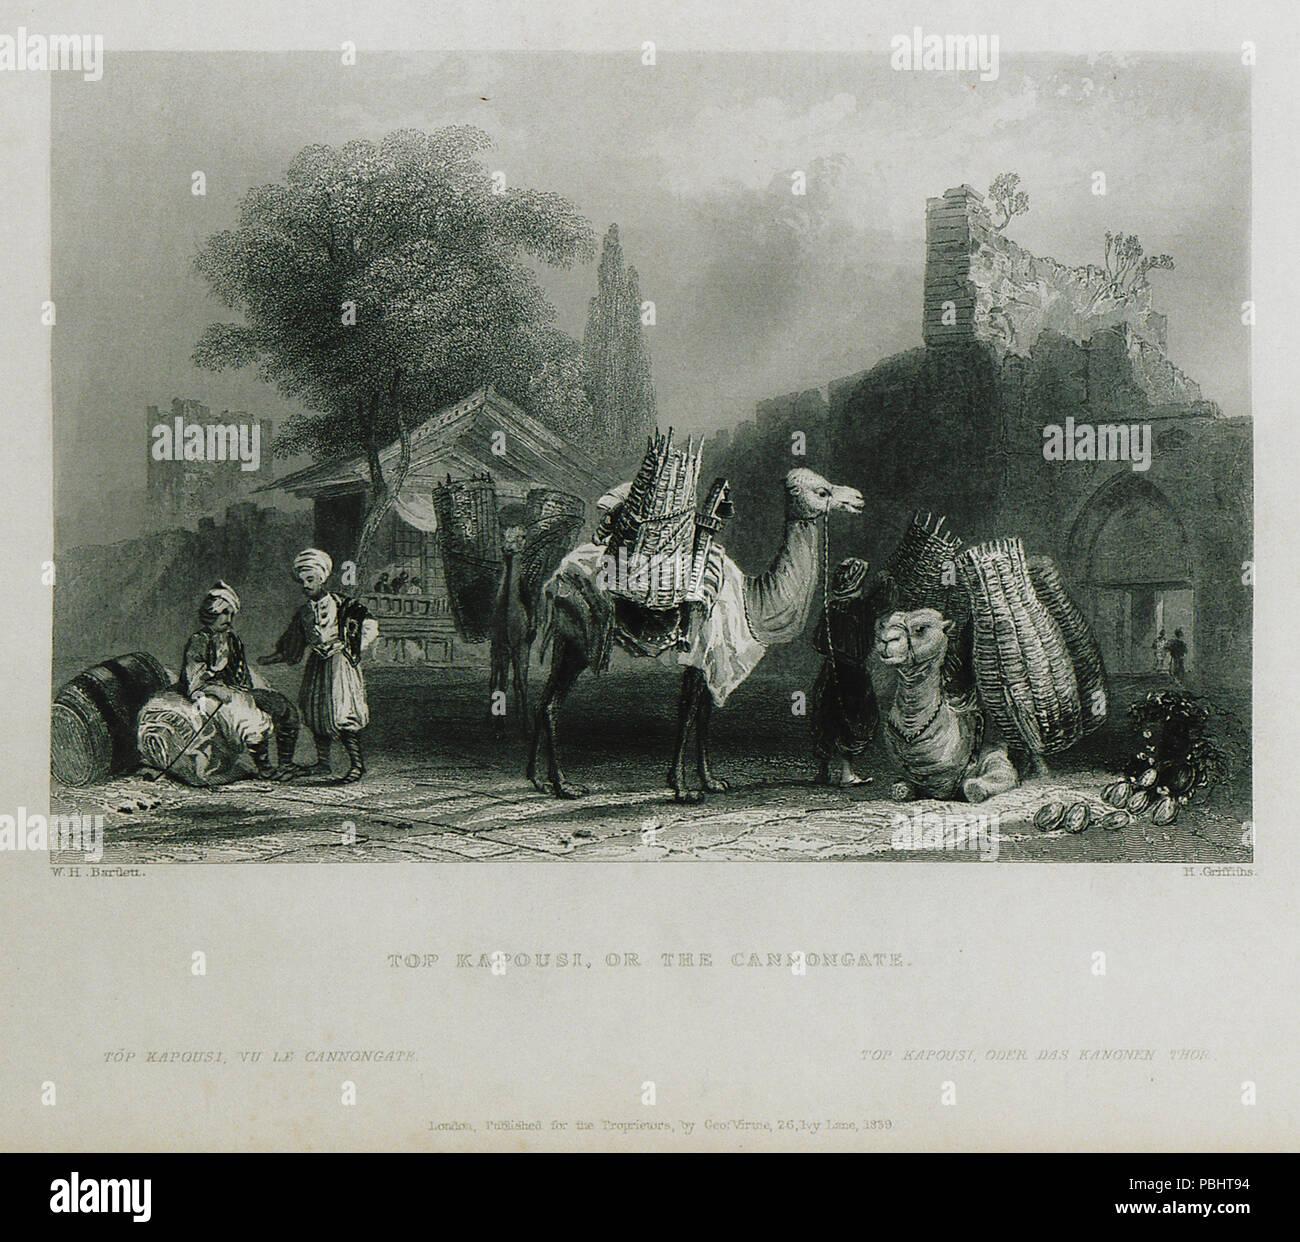 1756 Top kapousi, or the Cannongate - Pardoe Julia - 1838 Stock Photo